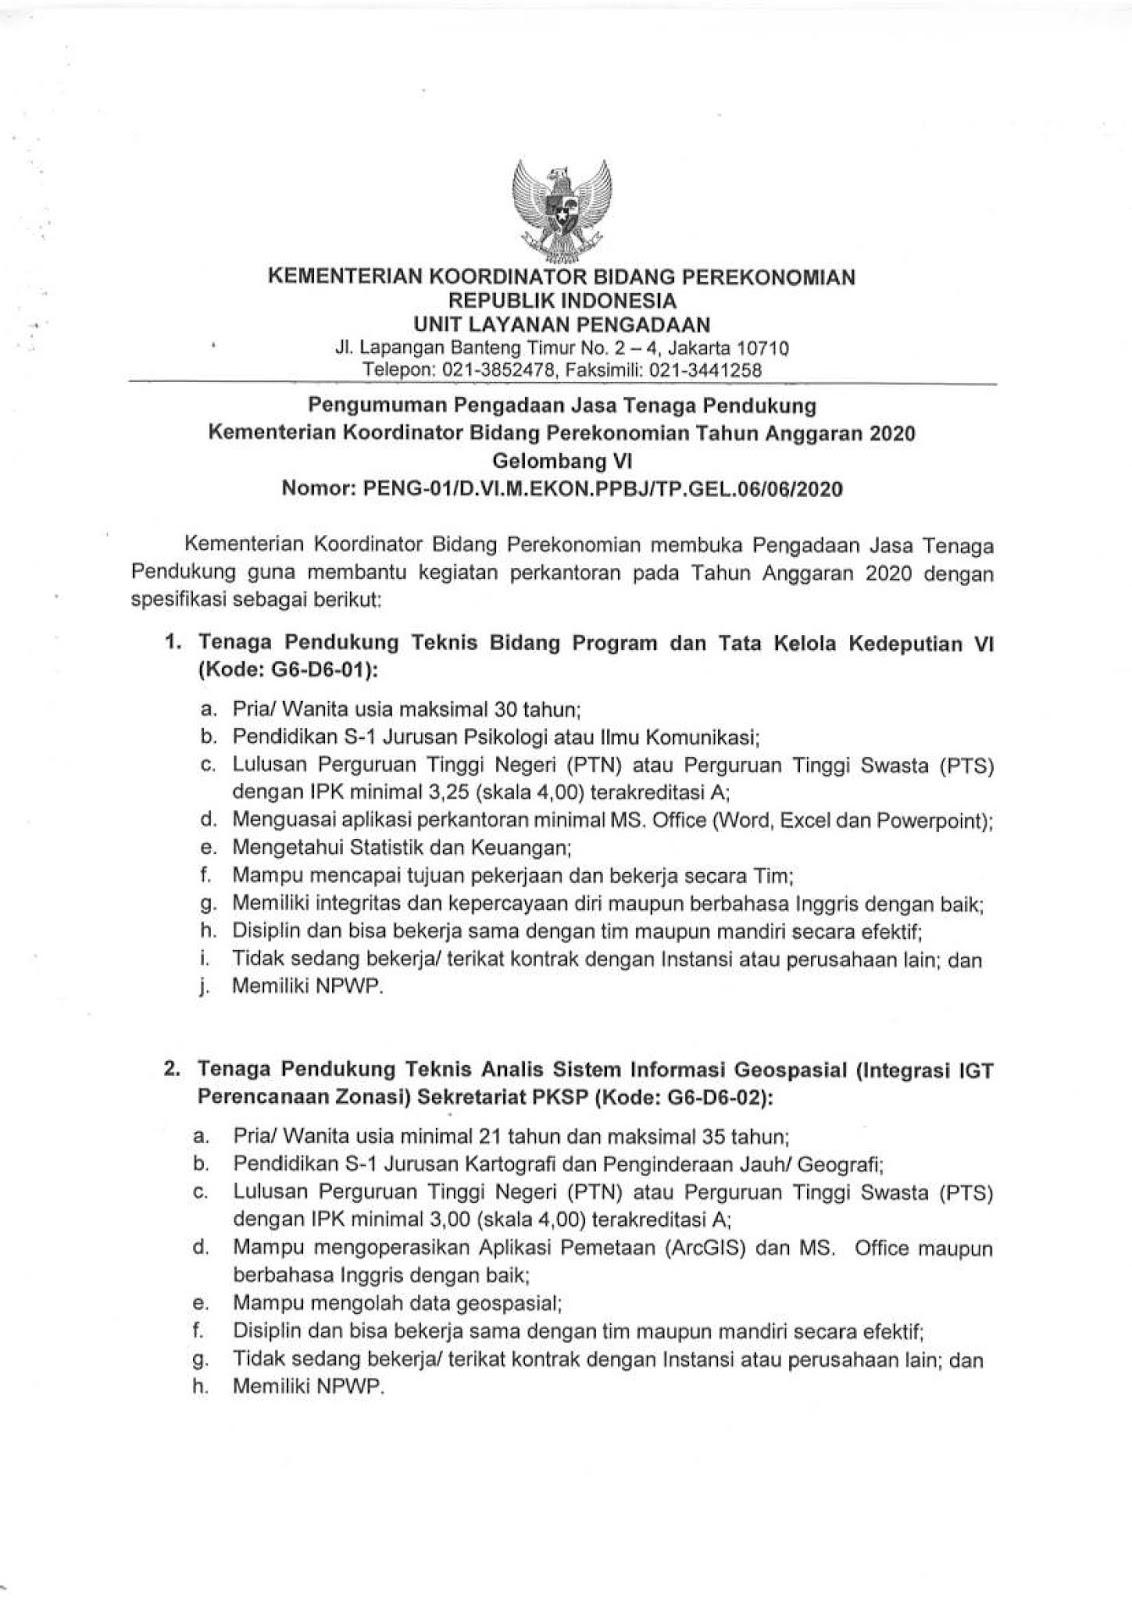 Lowongan Kerja Kementerian Koordinator Bidang Perekonomian Juni 2020